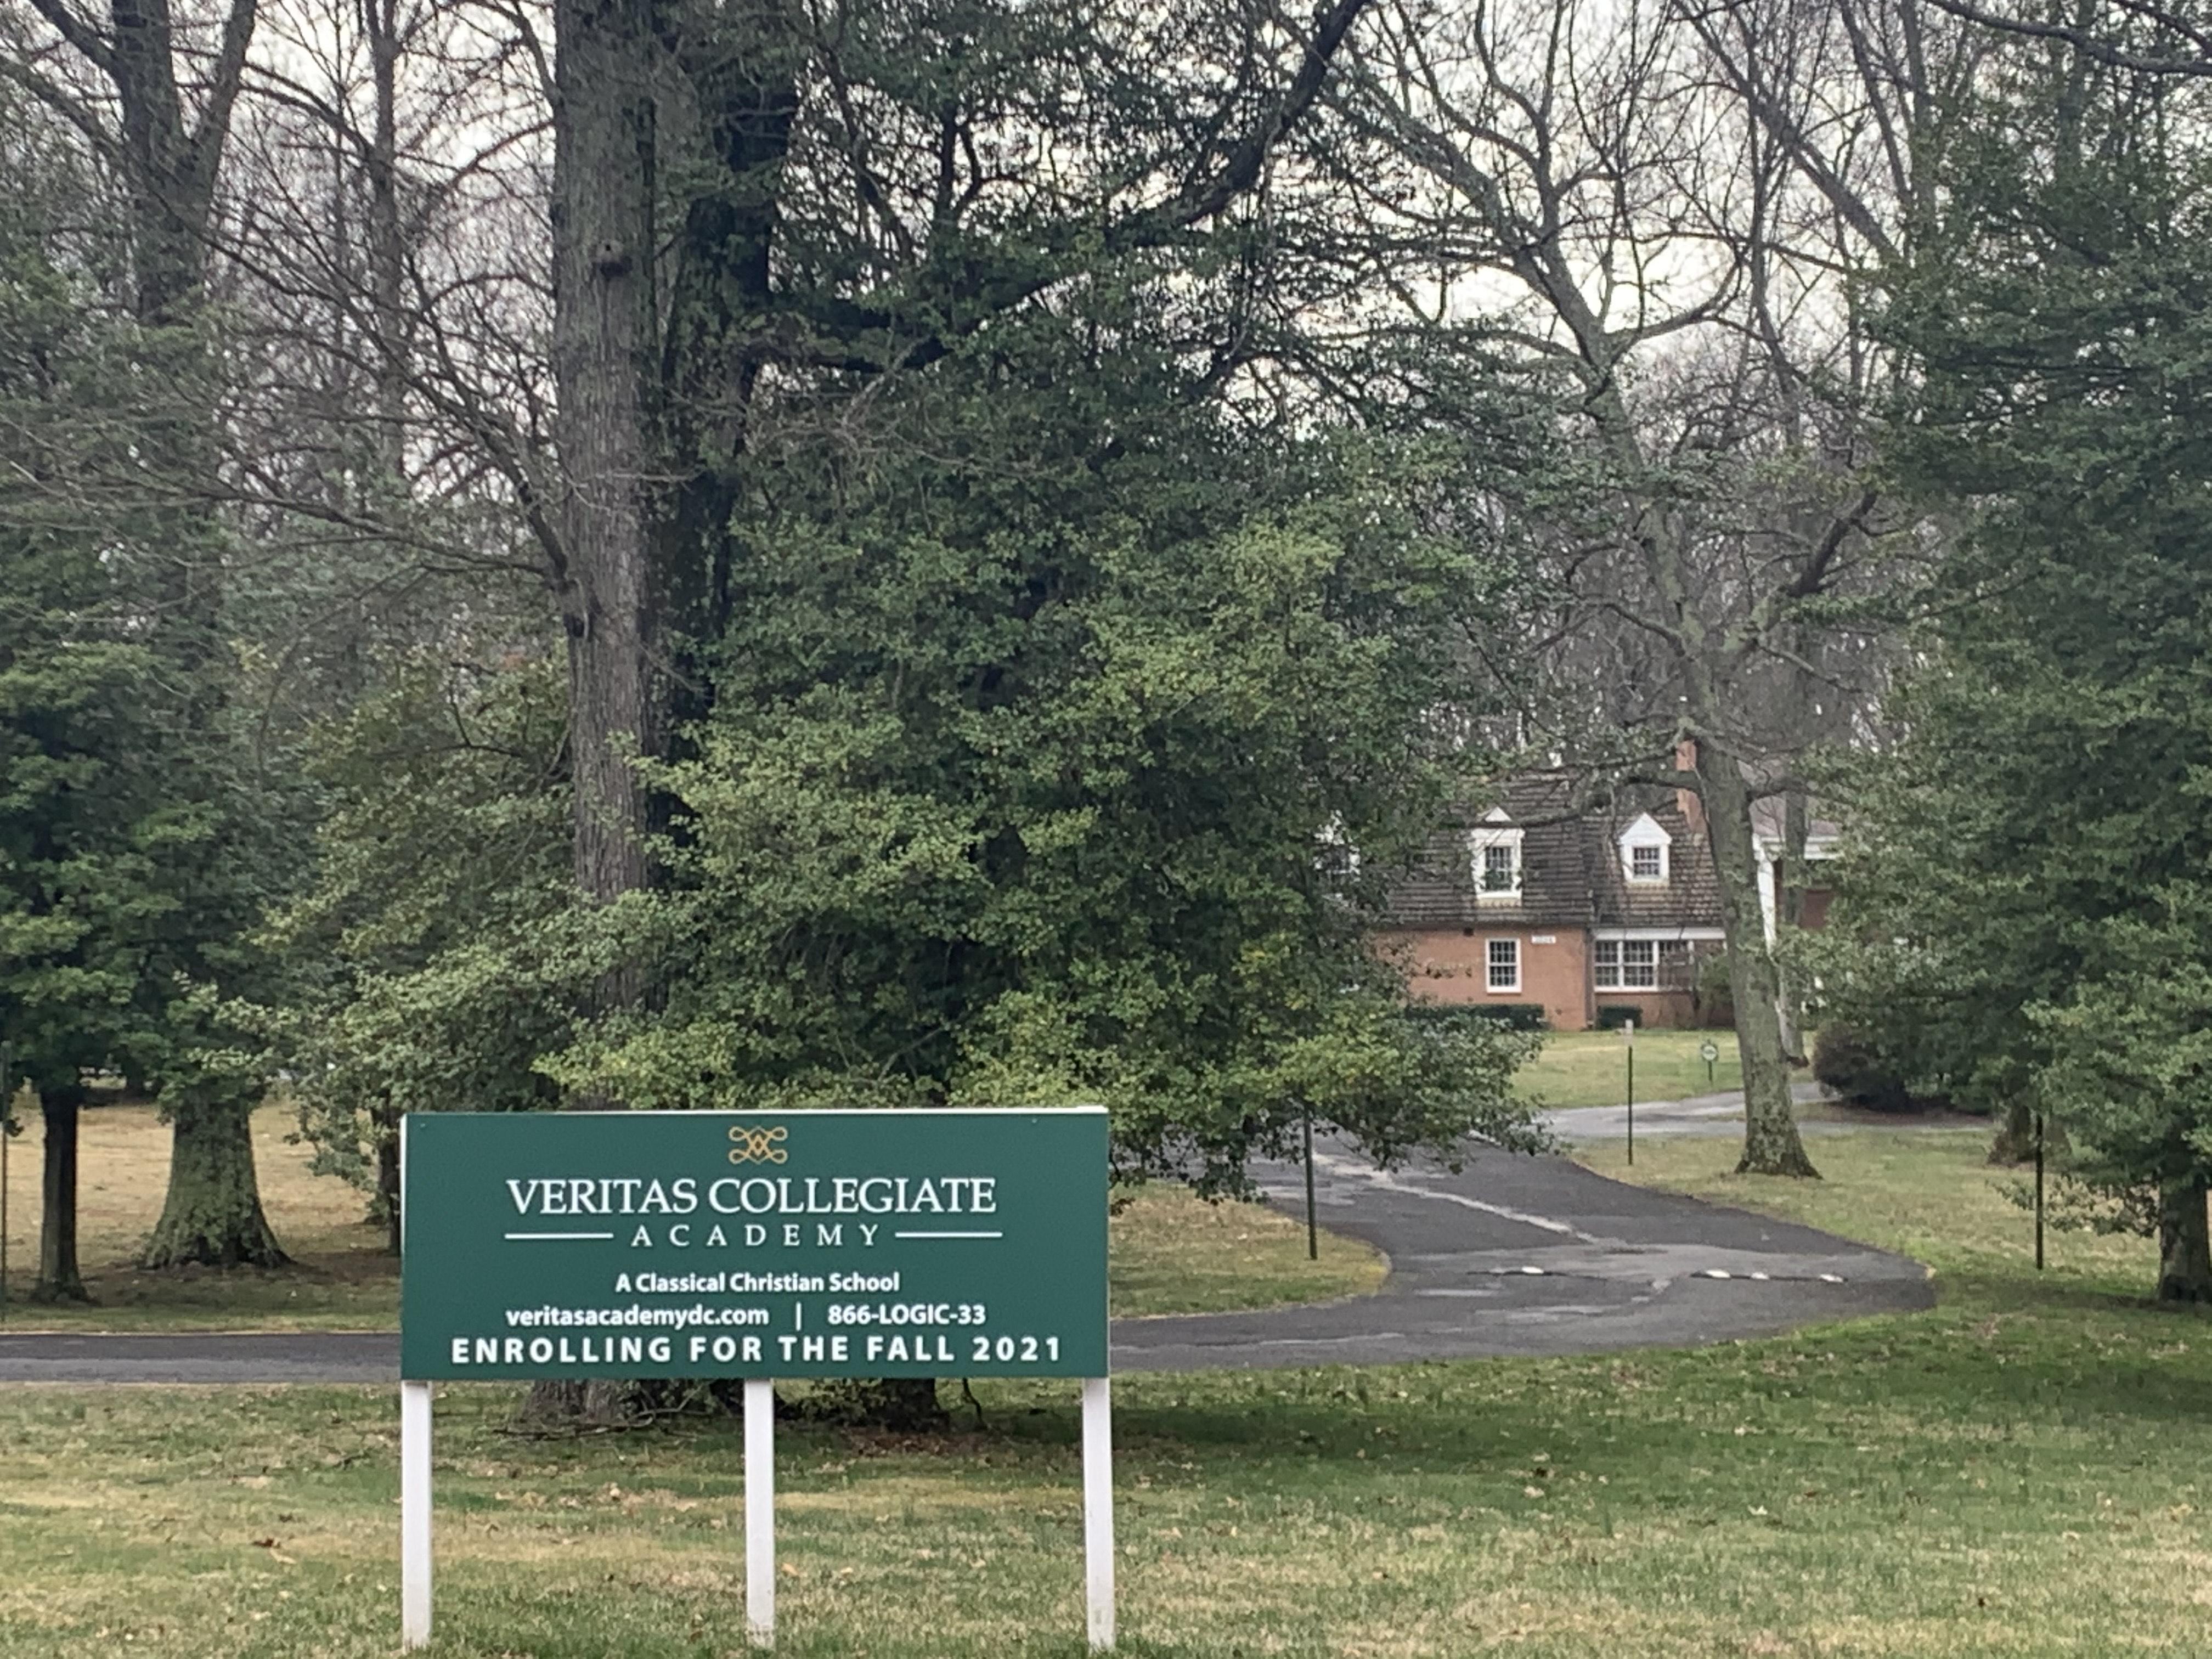 Veritas Collegiate Academy Sign Far